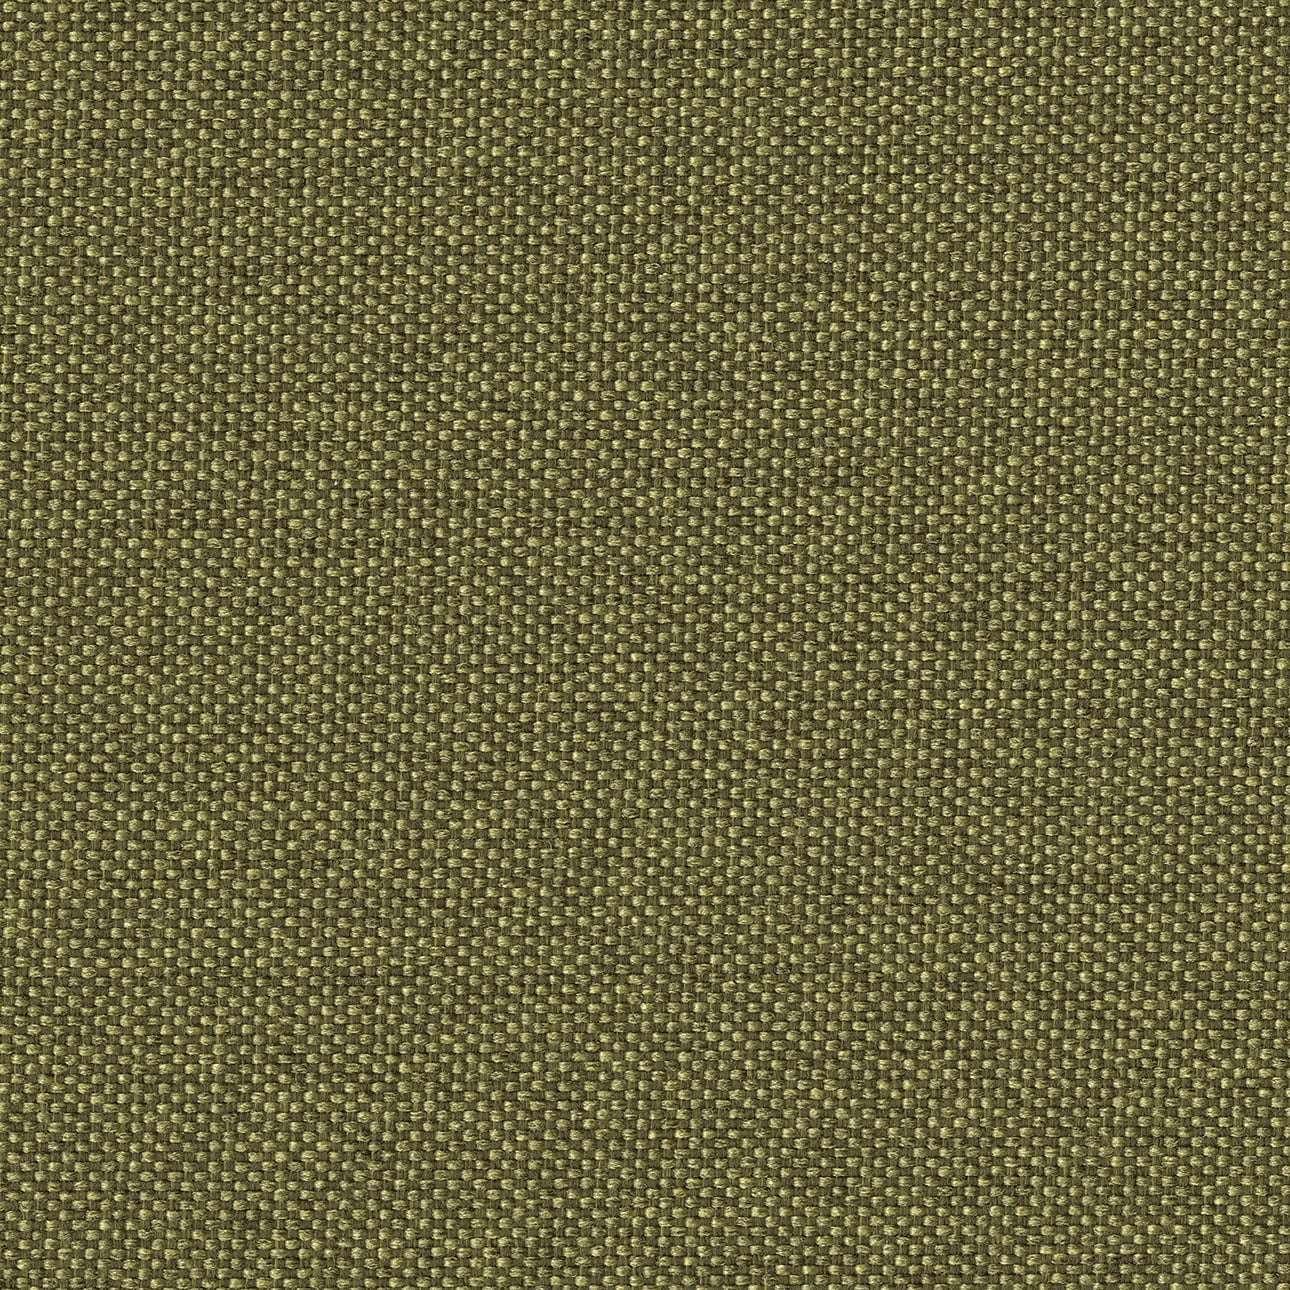 Stolehynde Ulrik fra kollektionen Etna, Stof: 161-26